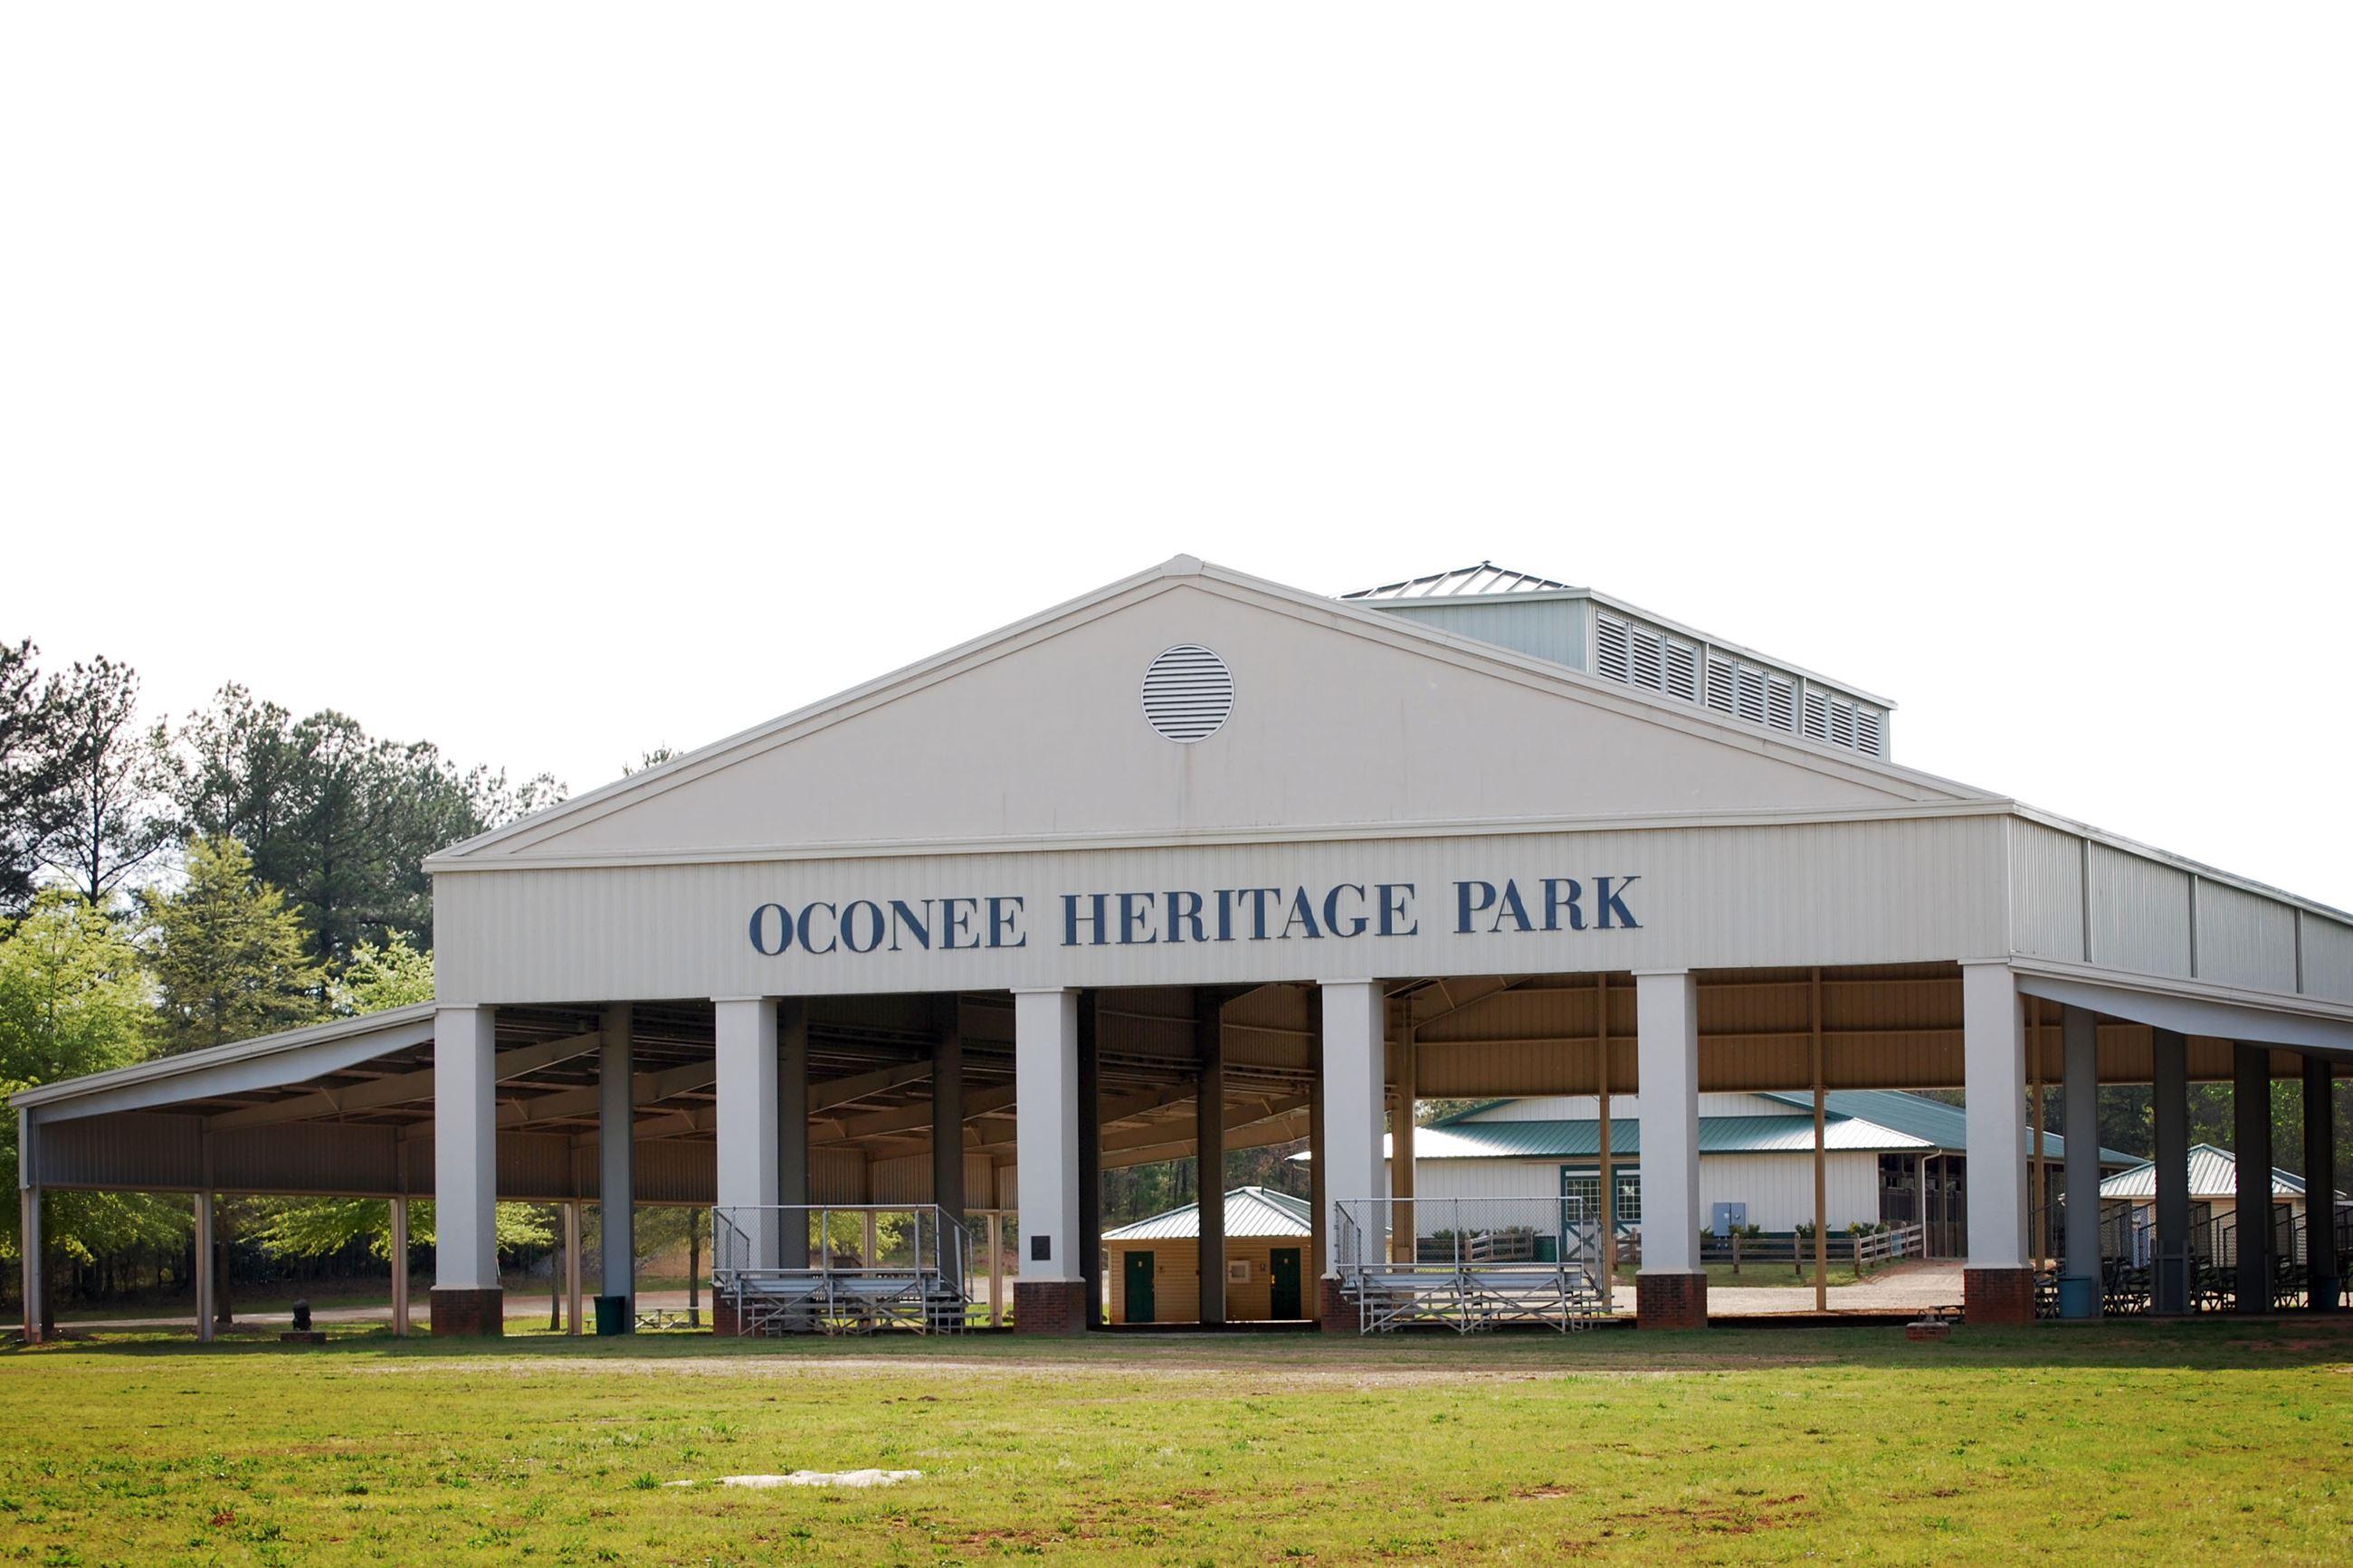 Photo from https://www.oconeecounty.com/941/Heritage-Park